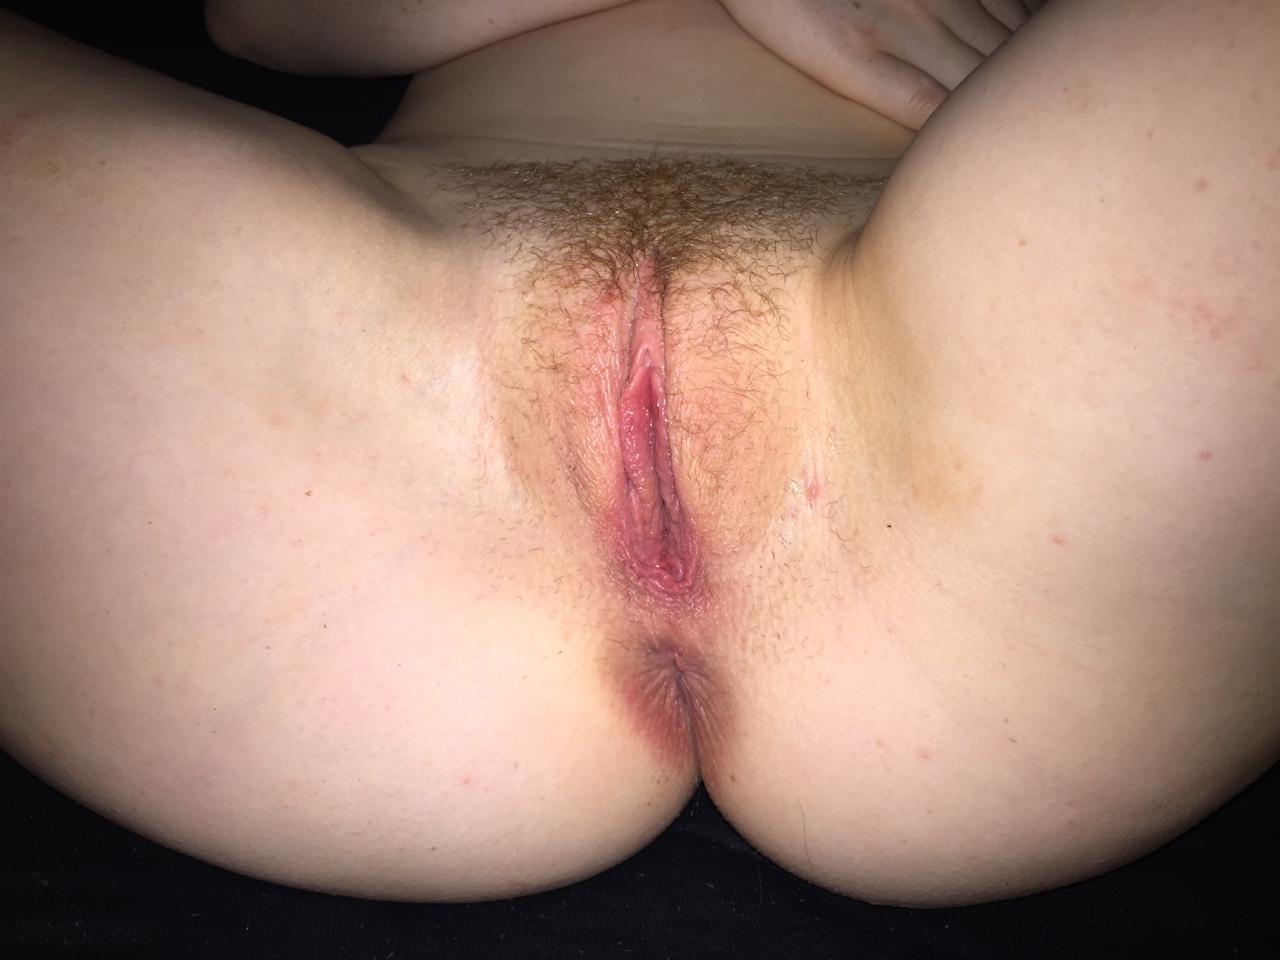 Unrasierte Vagina